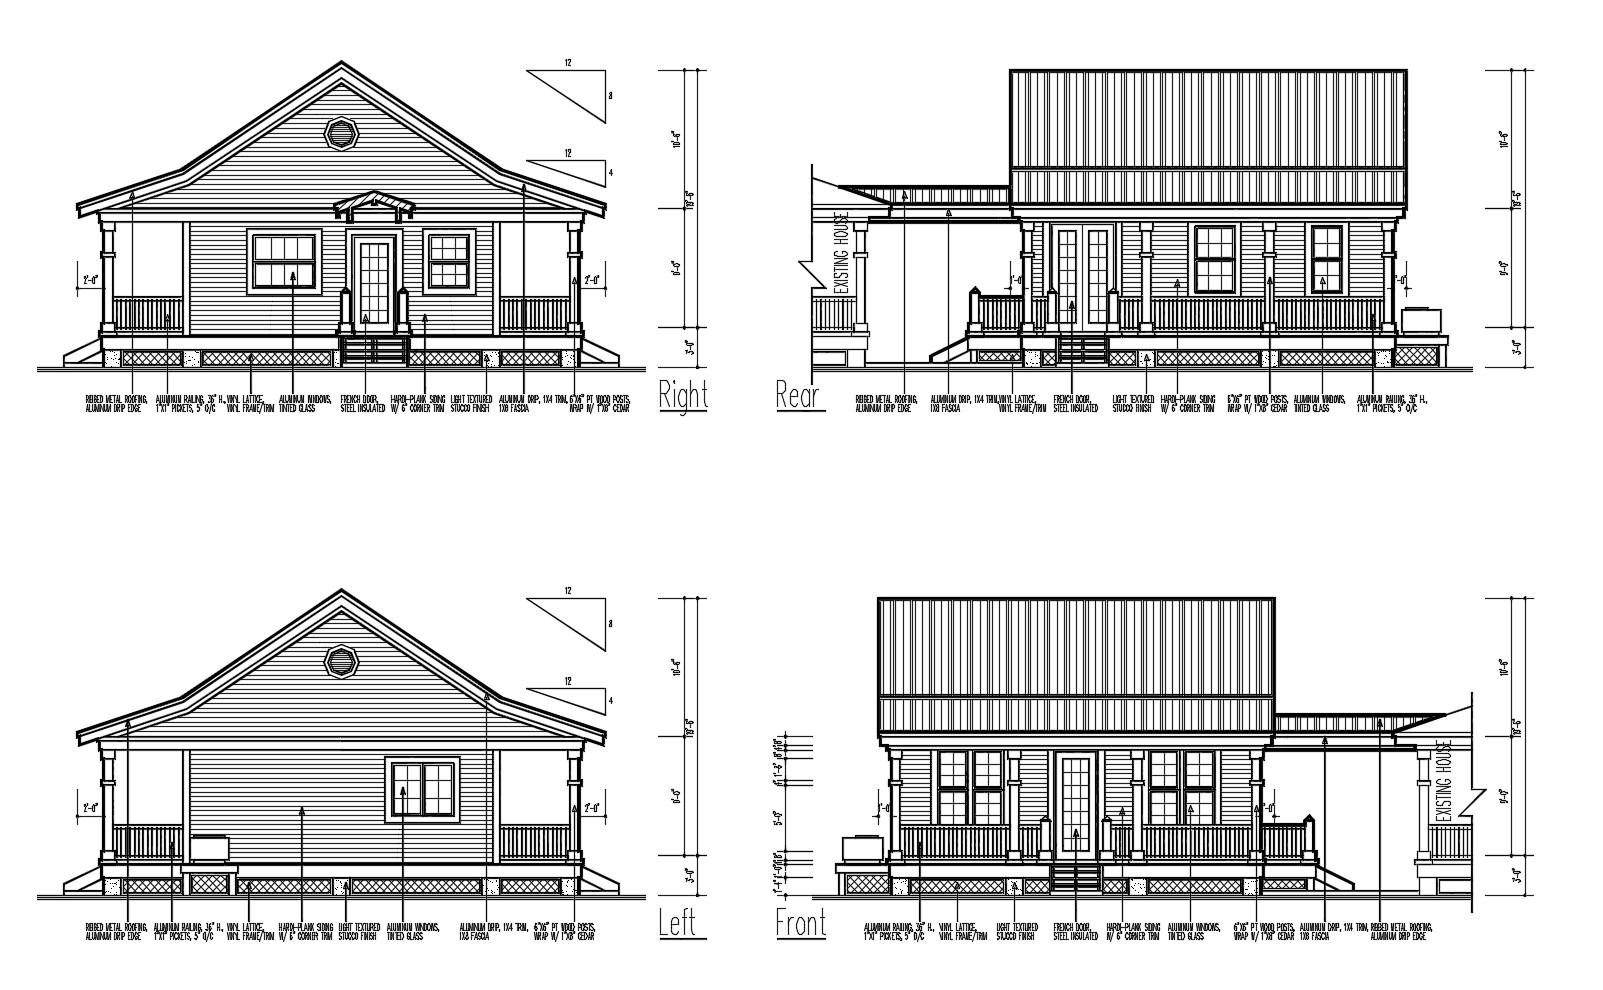 House Elevation Design In AutoCAD File Cadbull